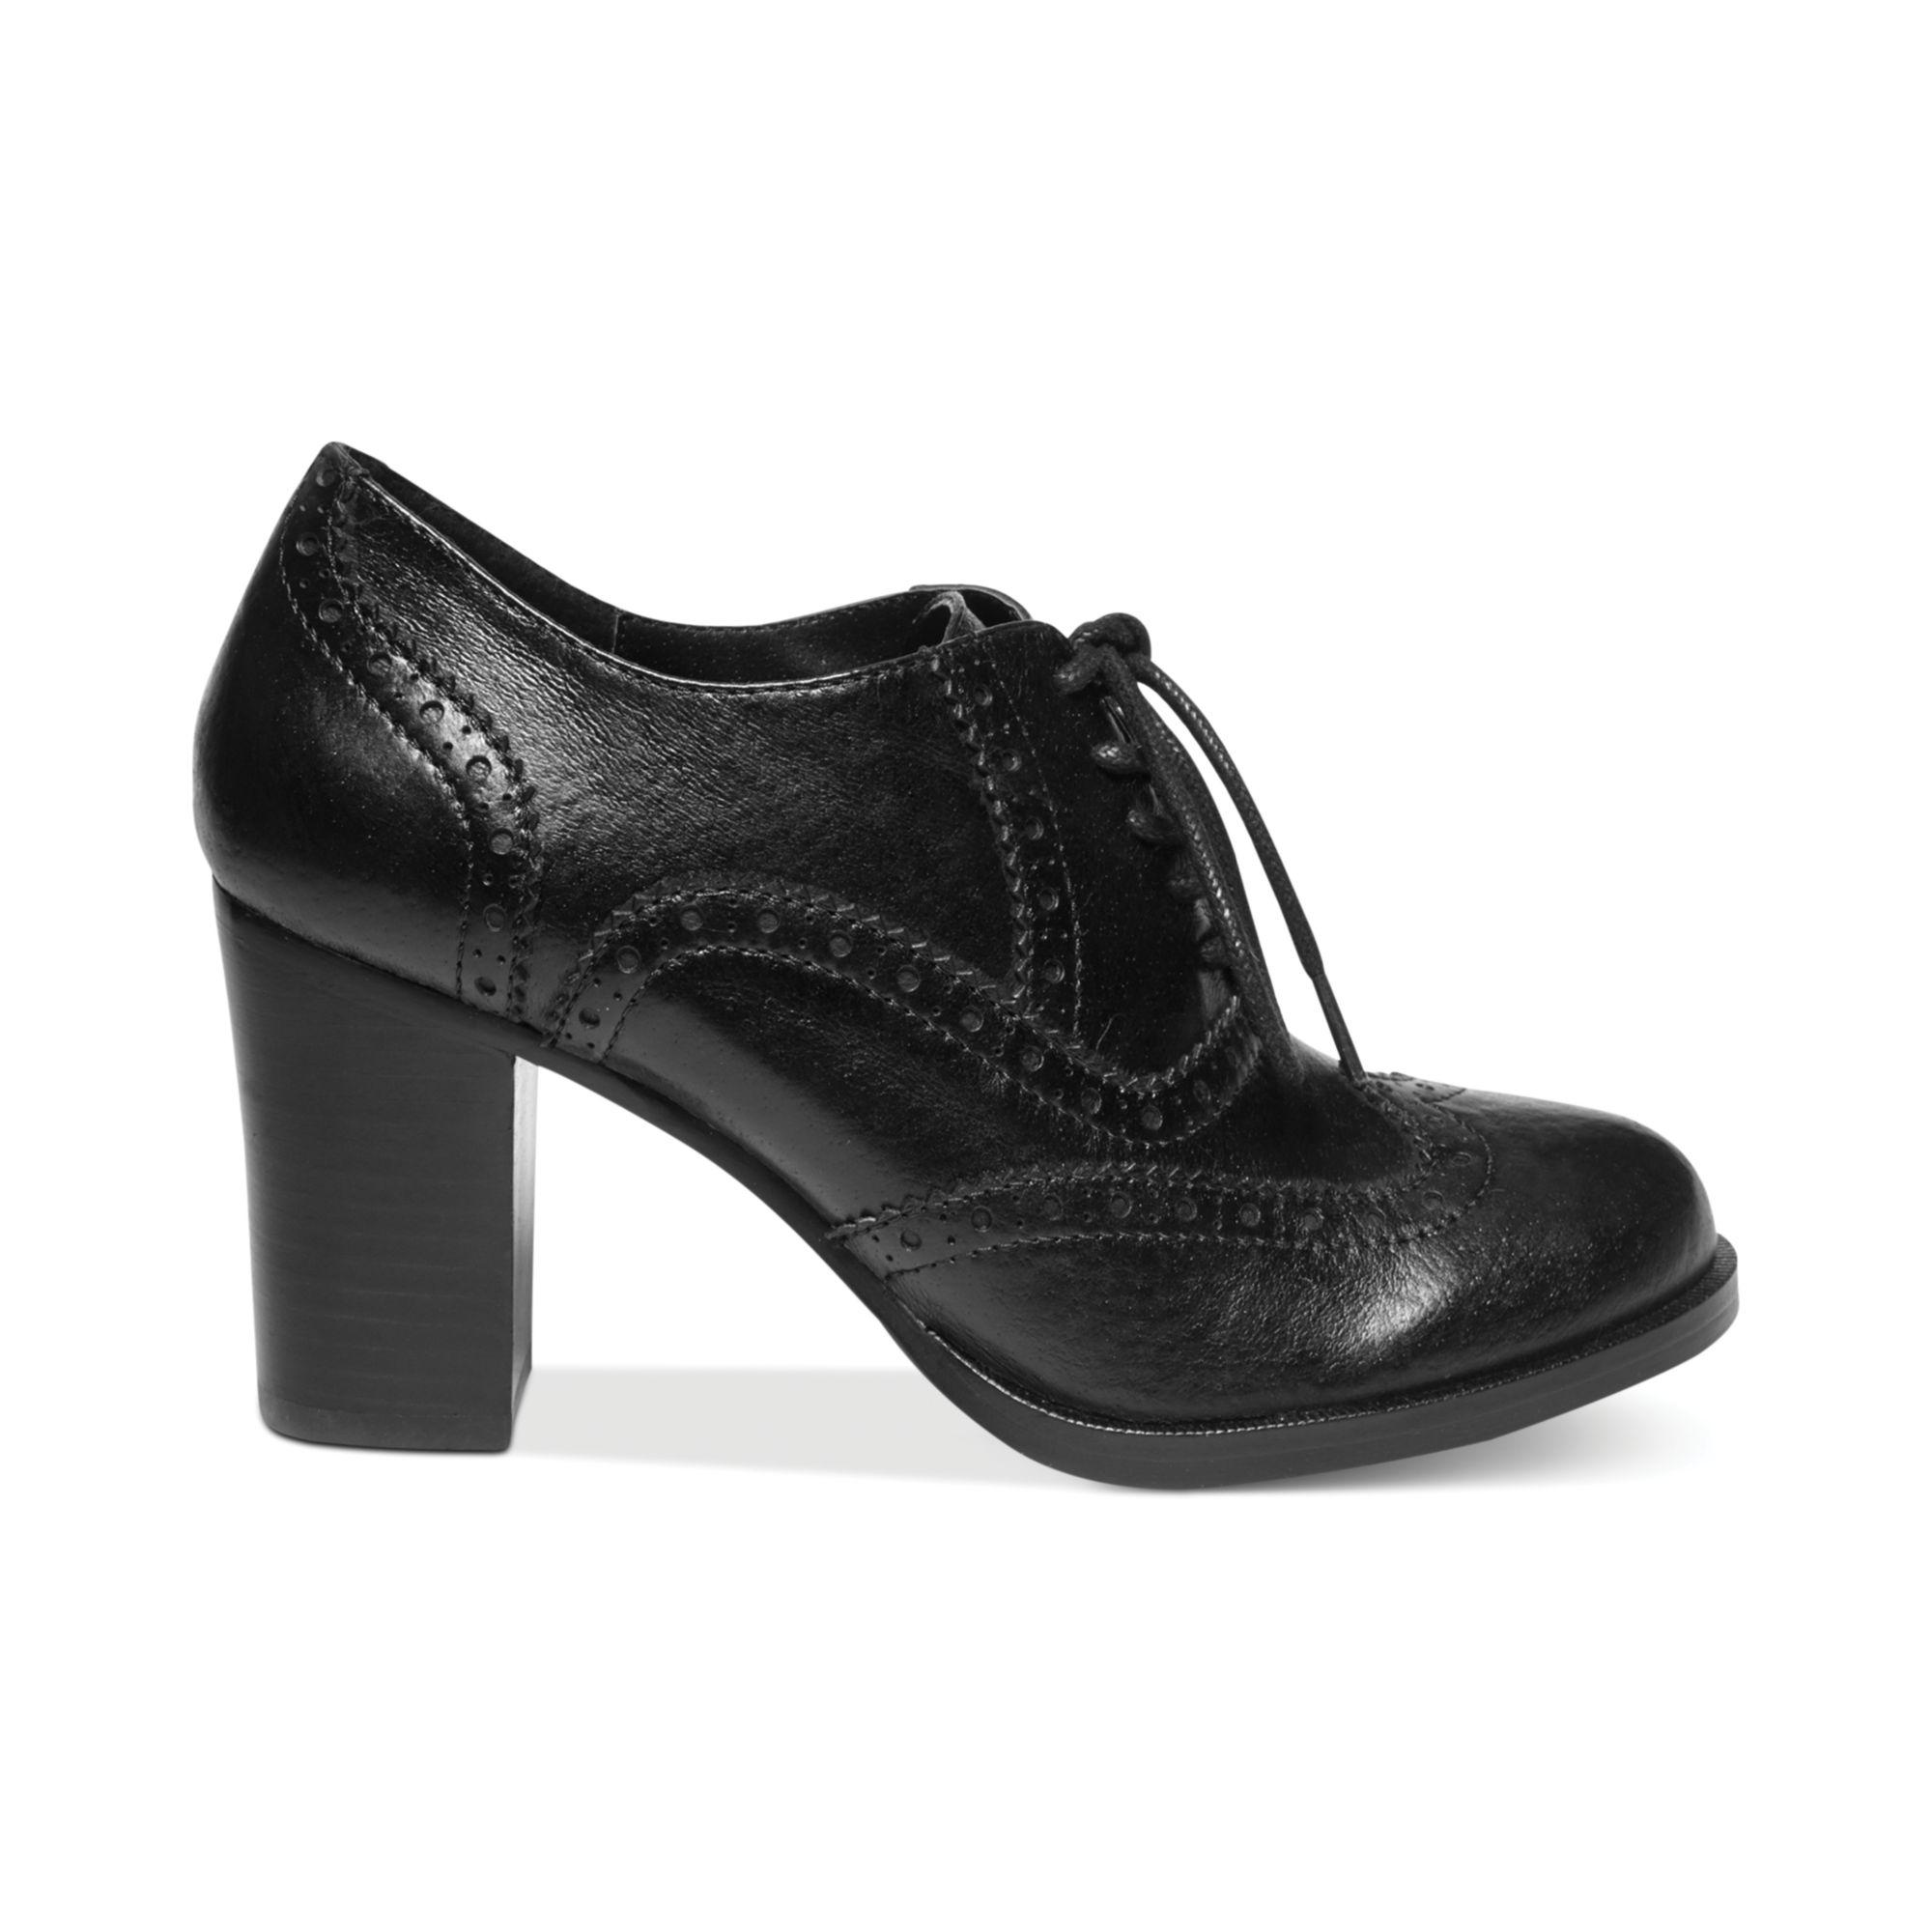 Aerosoles Black Oxford Shoes Womens